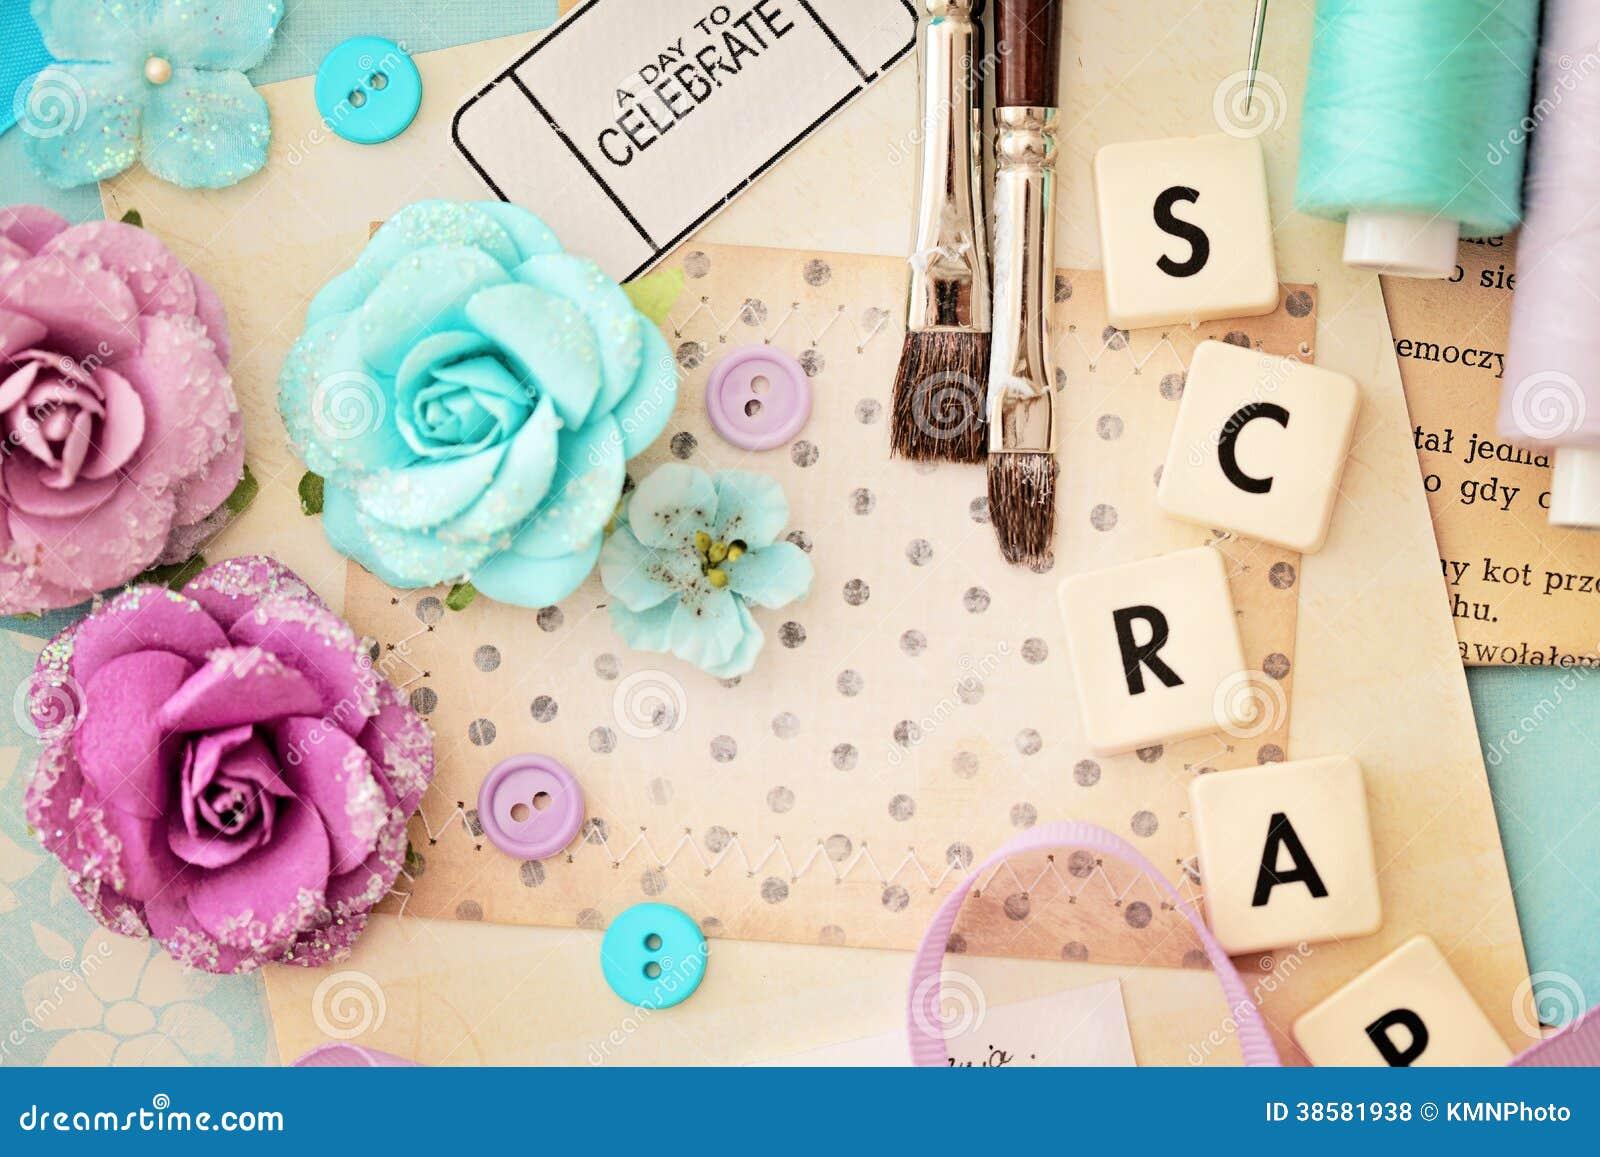 How to scrapbook materials - Scrapbooking Craft Materials Royalty Free Stock Photos